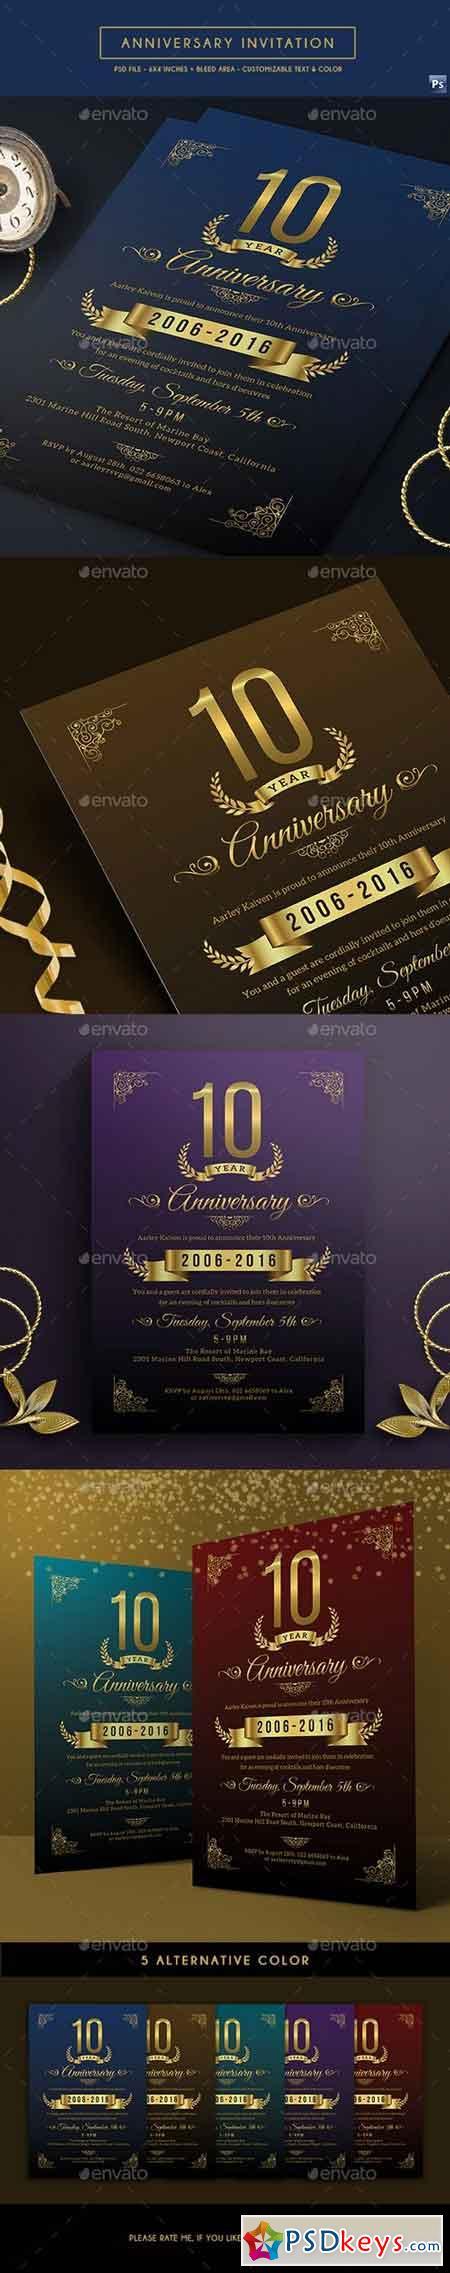 Anniversary Invitation 17546141